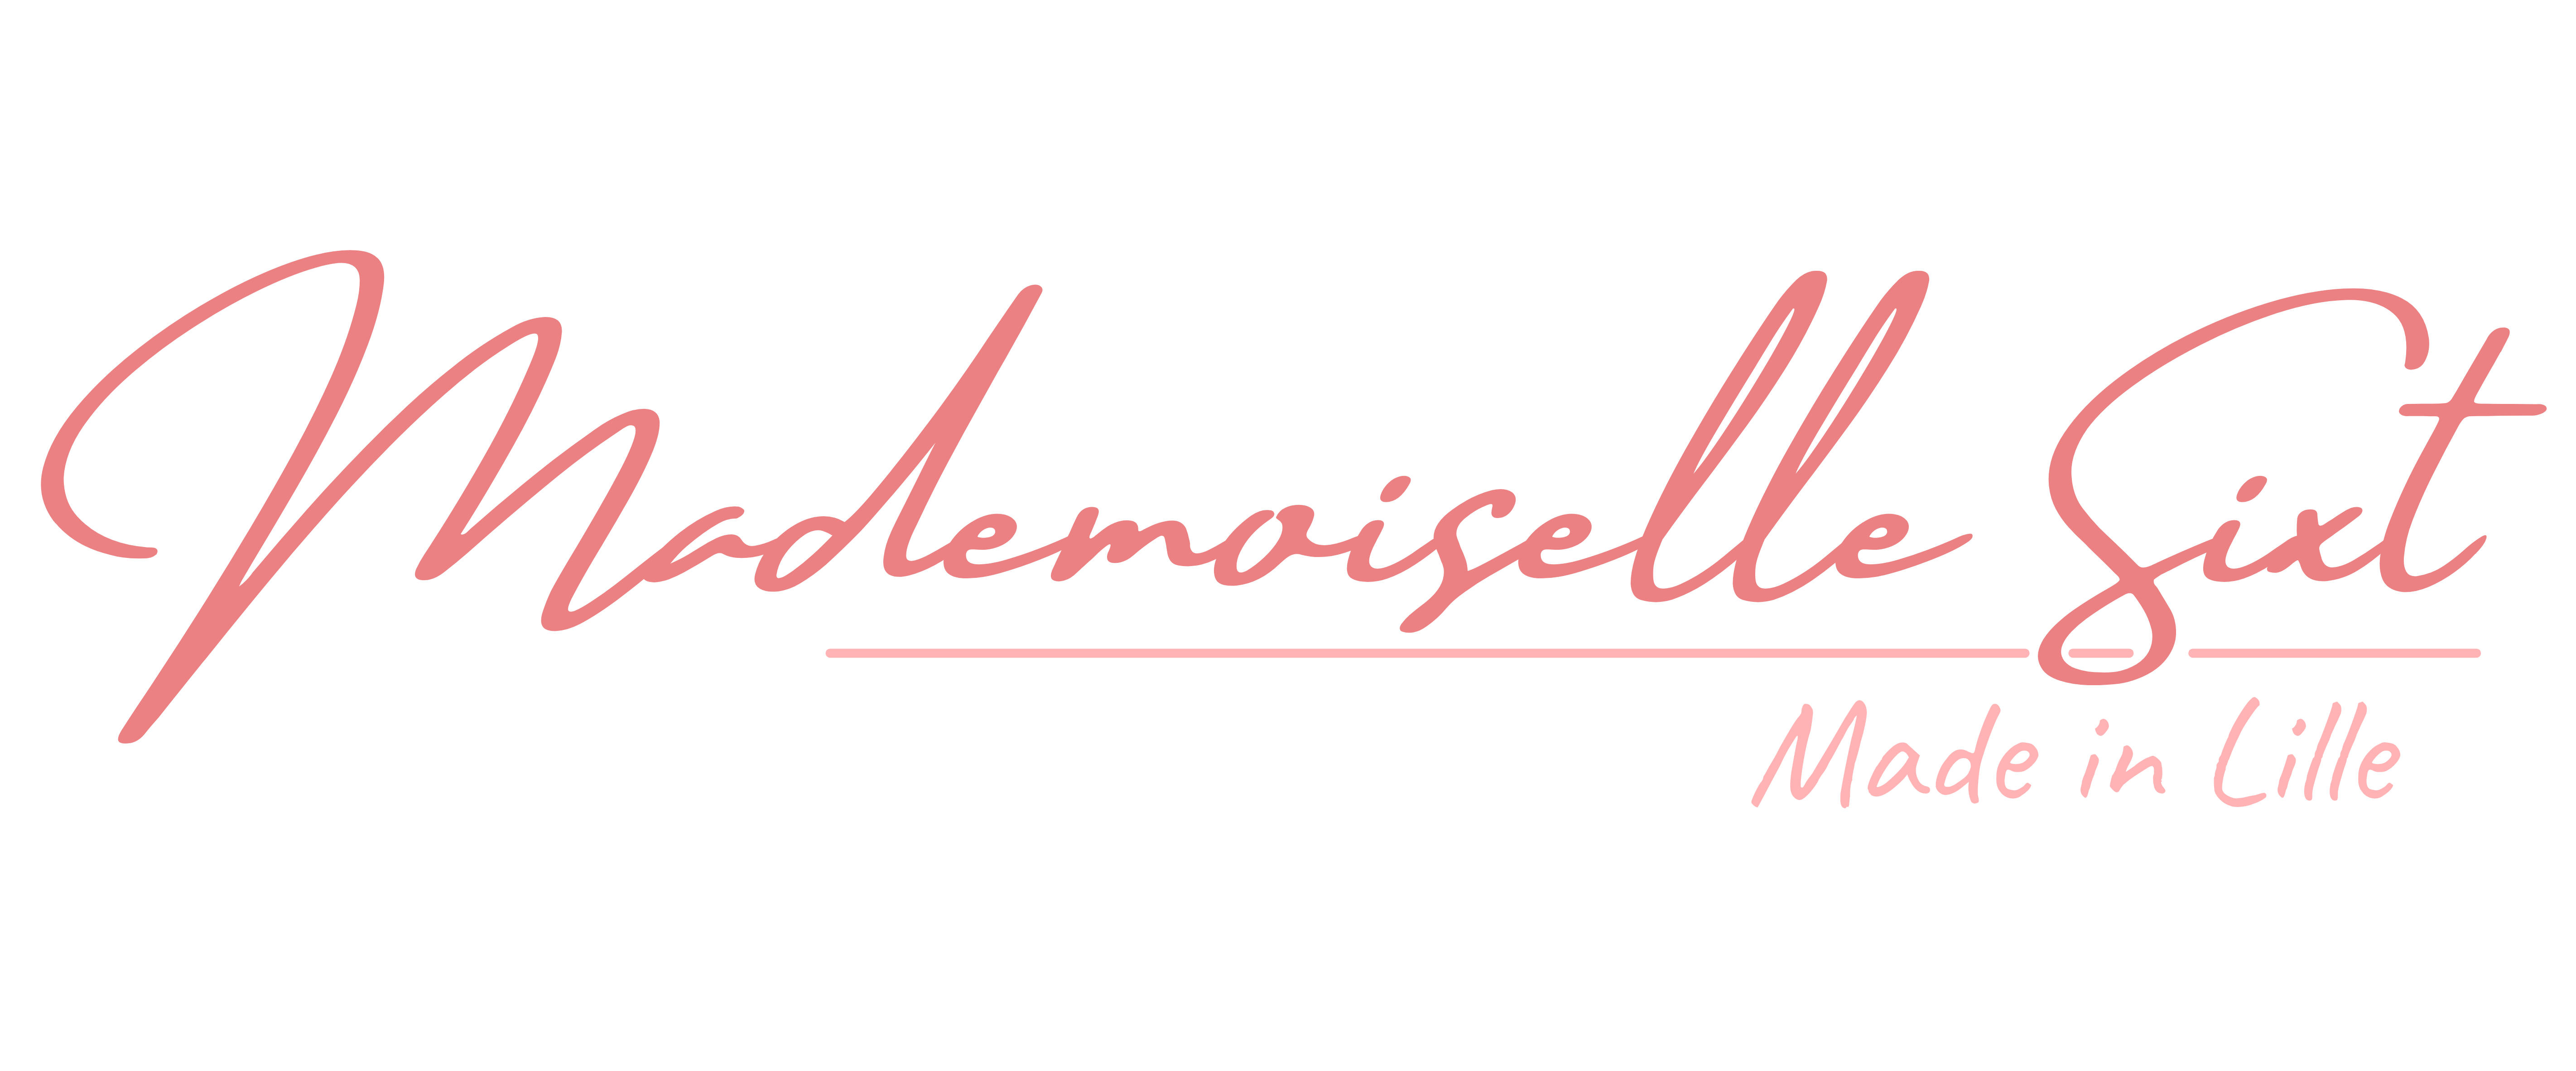 Mademoiselle Sixt